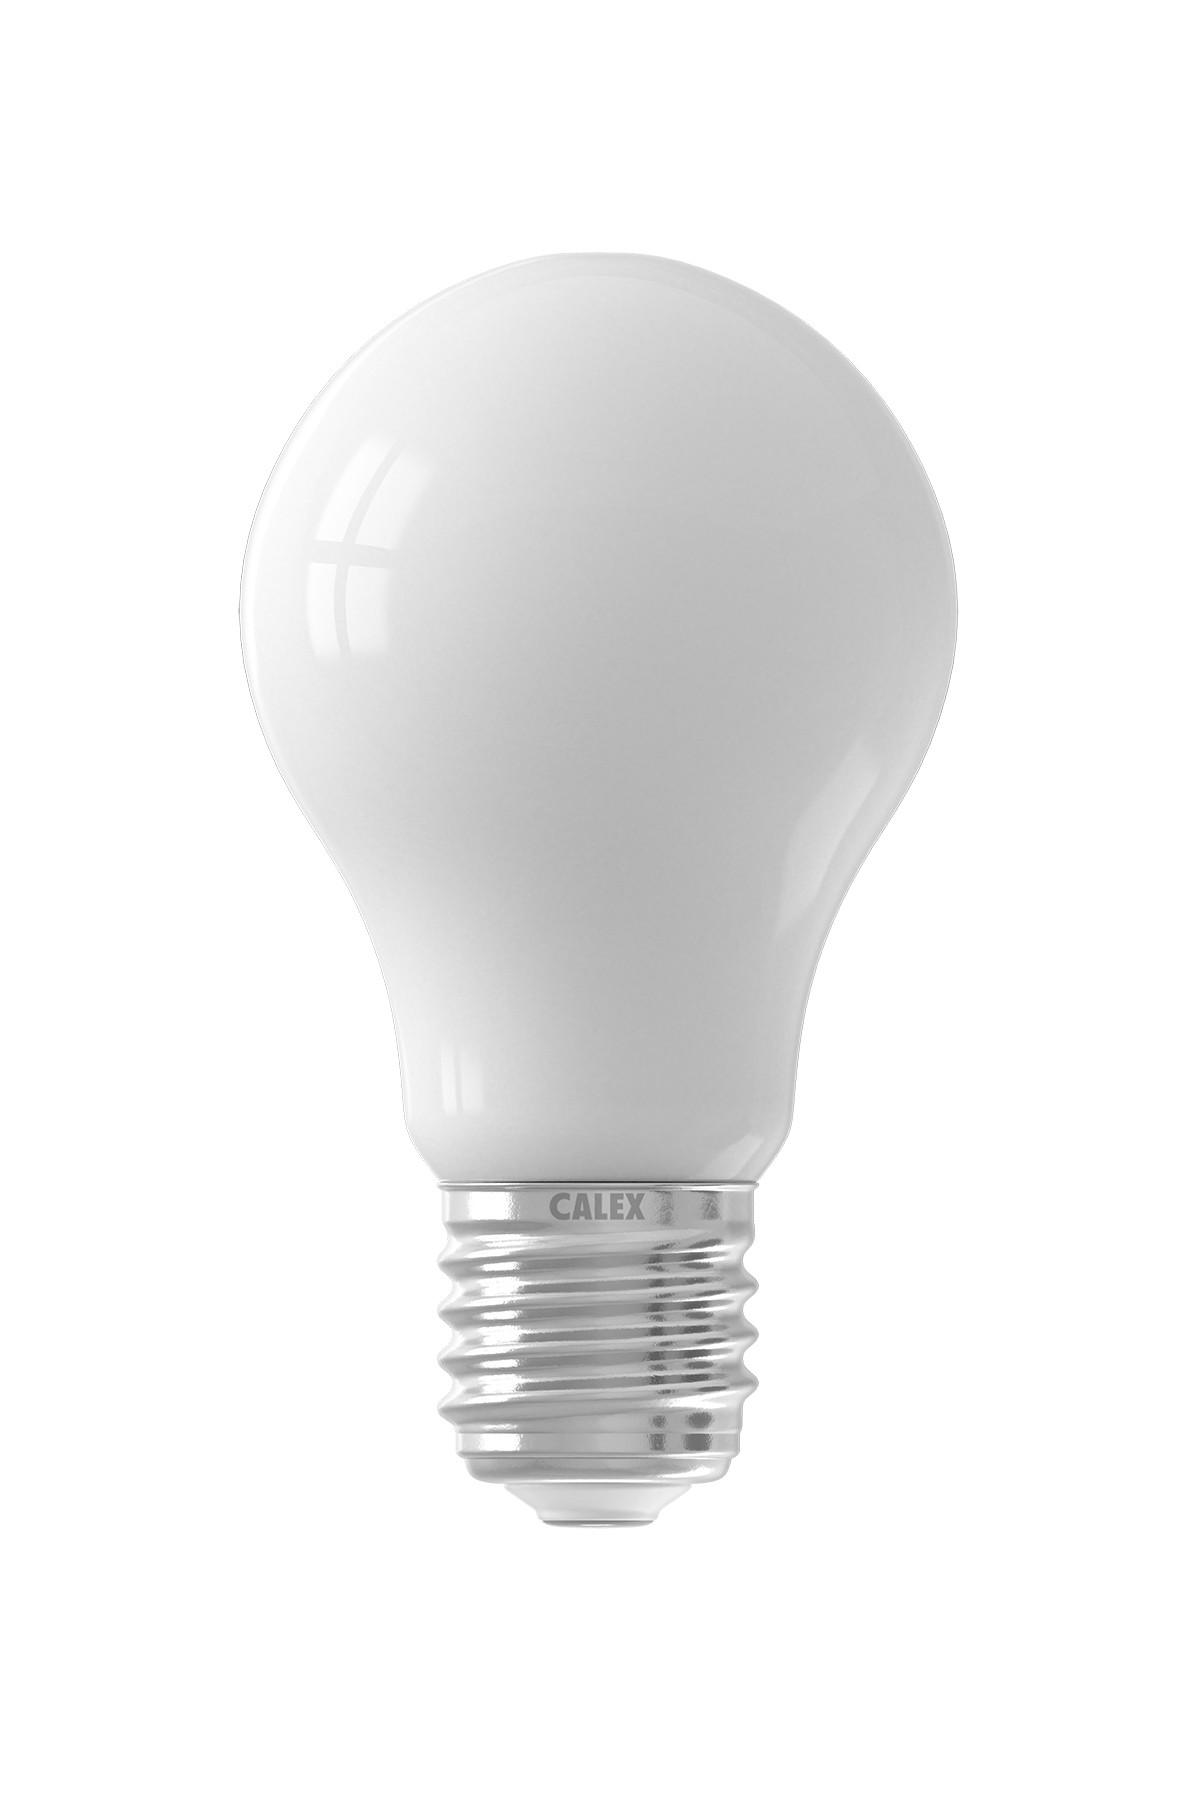 Calex LED volglas Filament Standaardlamp  220-240V 8W 1000lm E27 A67, Softline 2700K CRI80 dimbaar